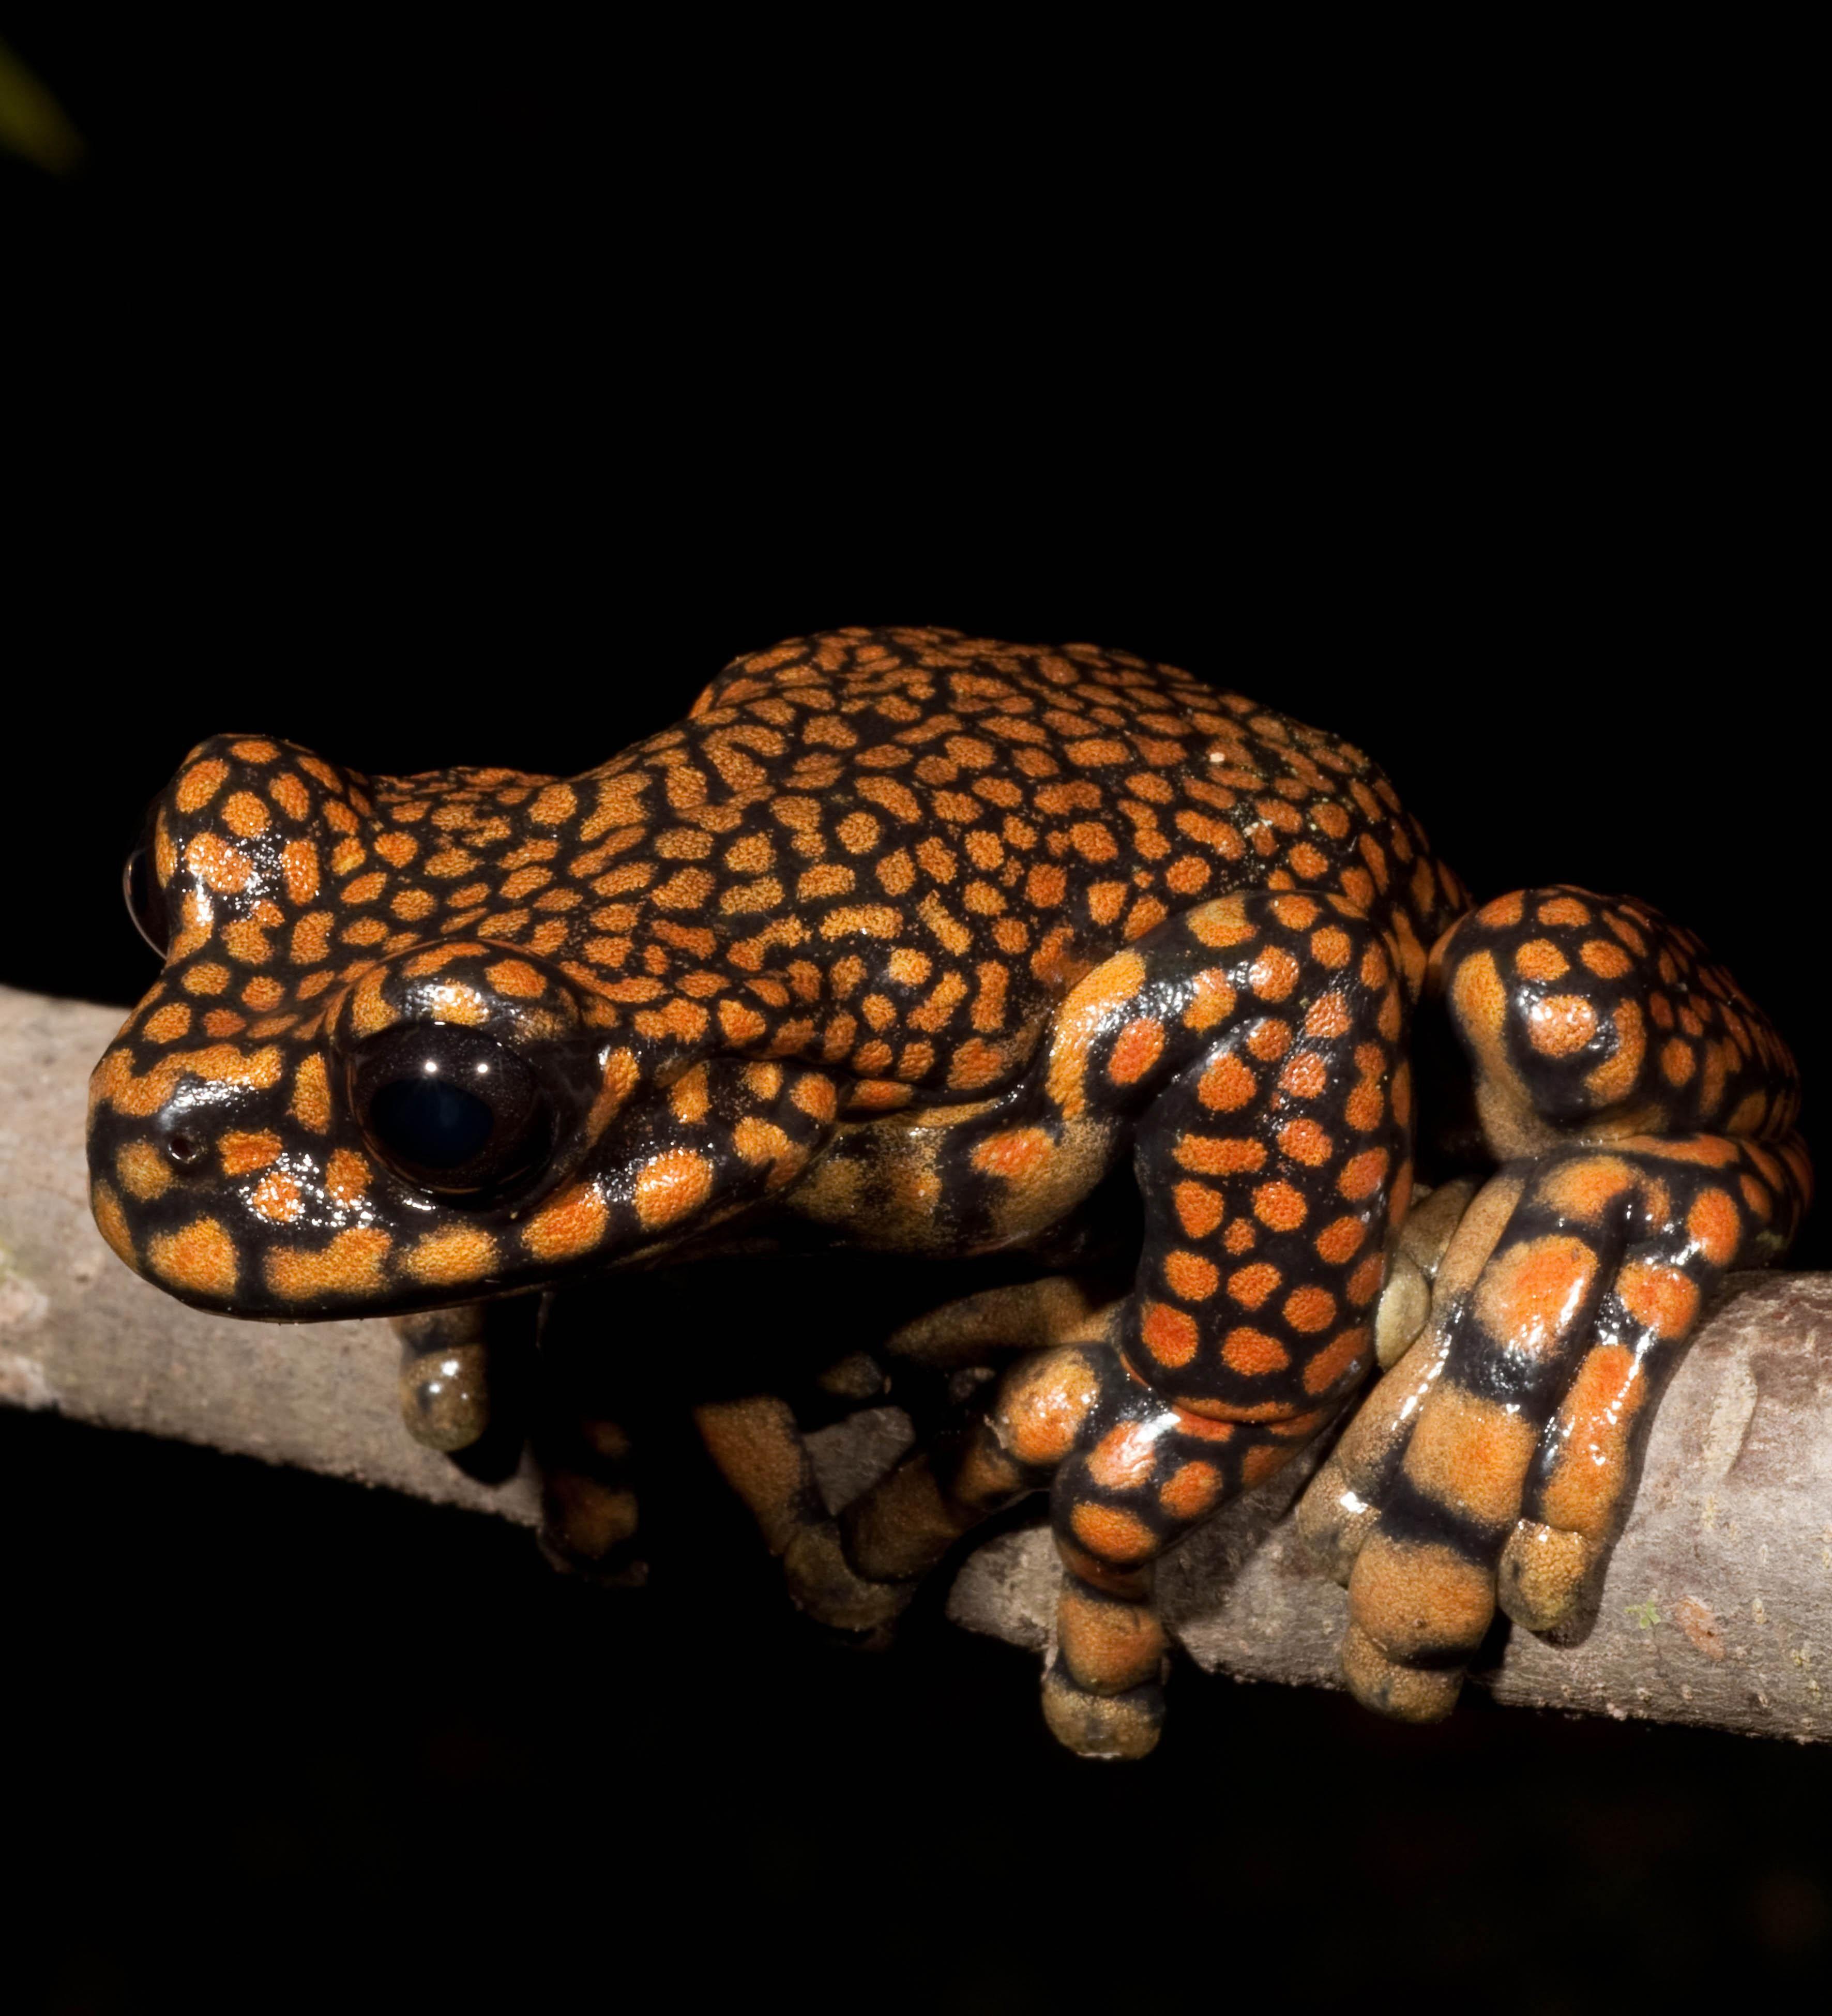 Una granota arboricola de la especie Hyloscirtus princecharlesi ...